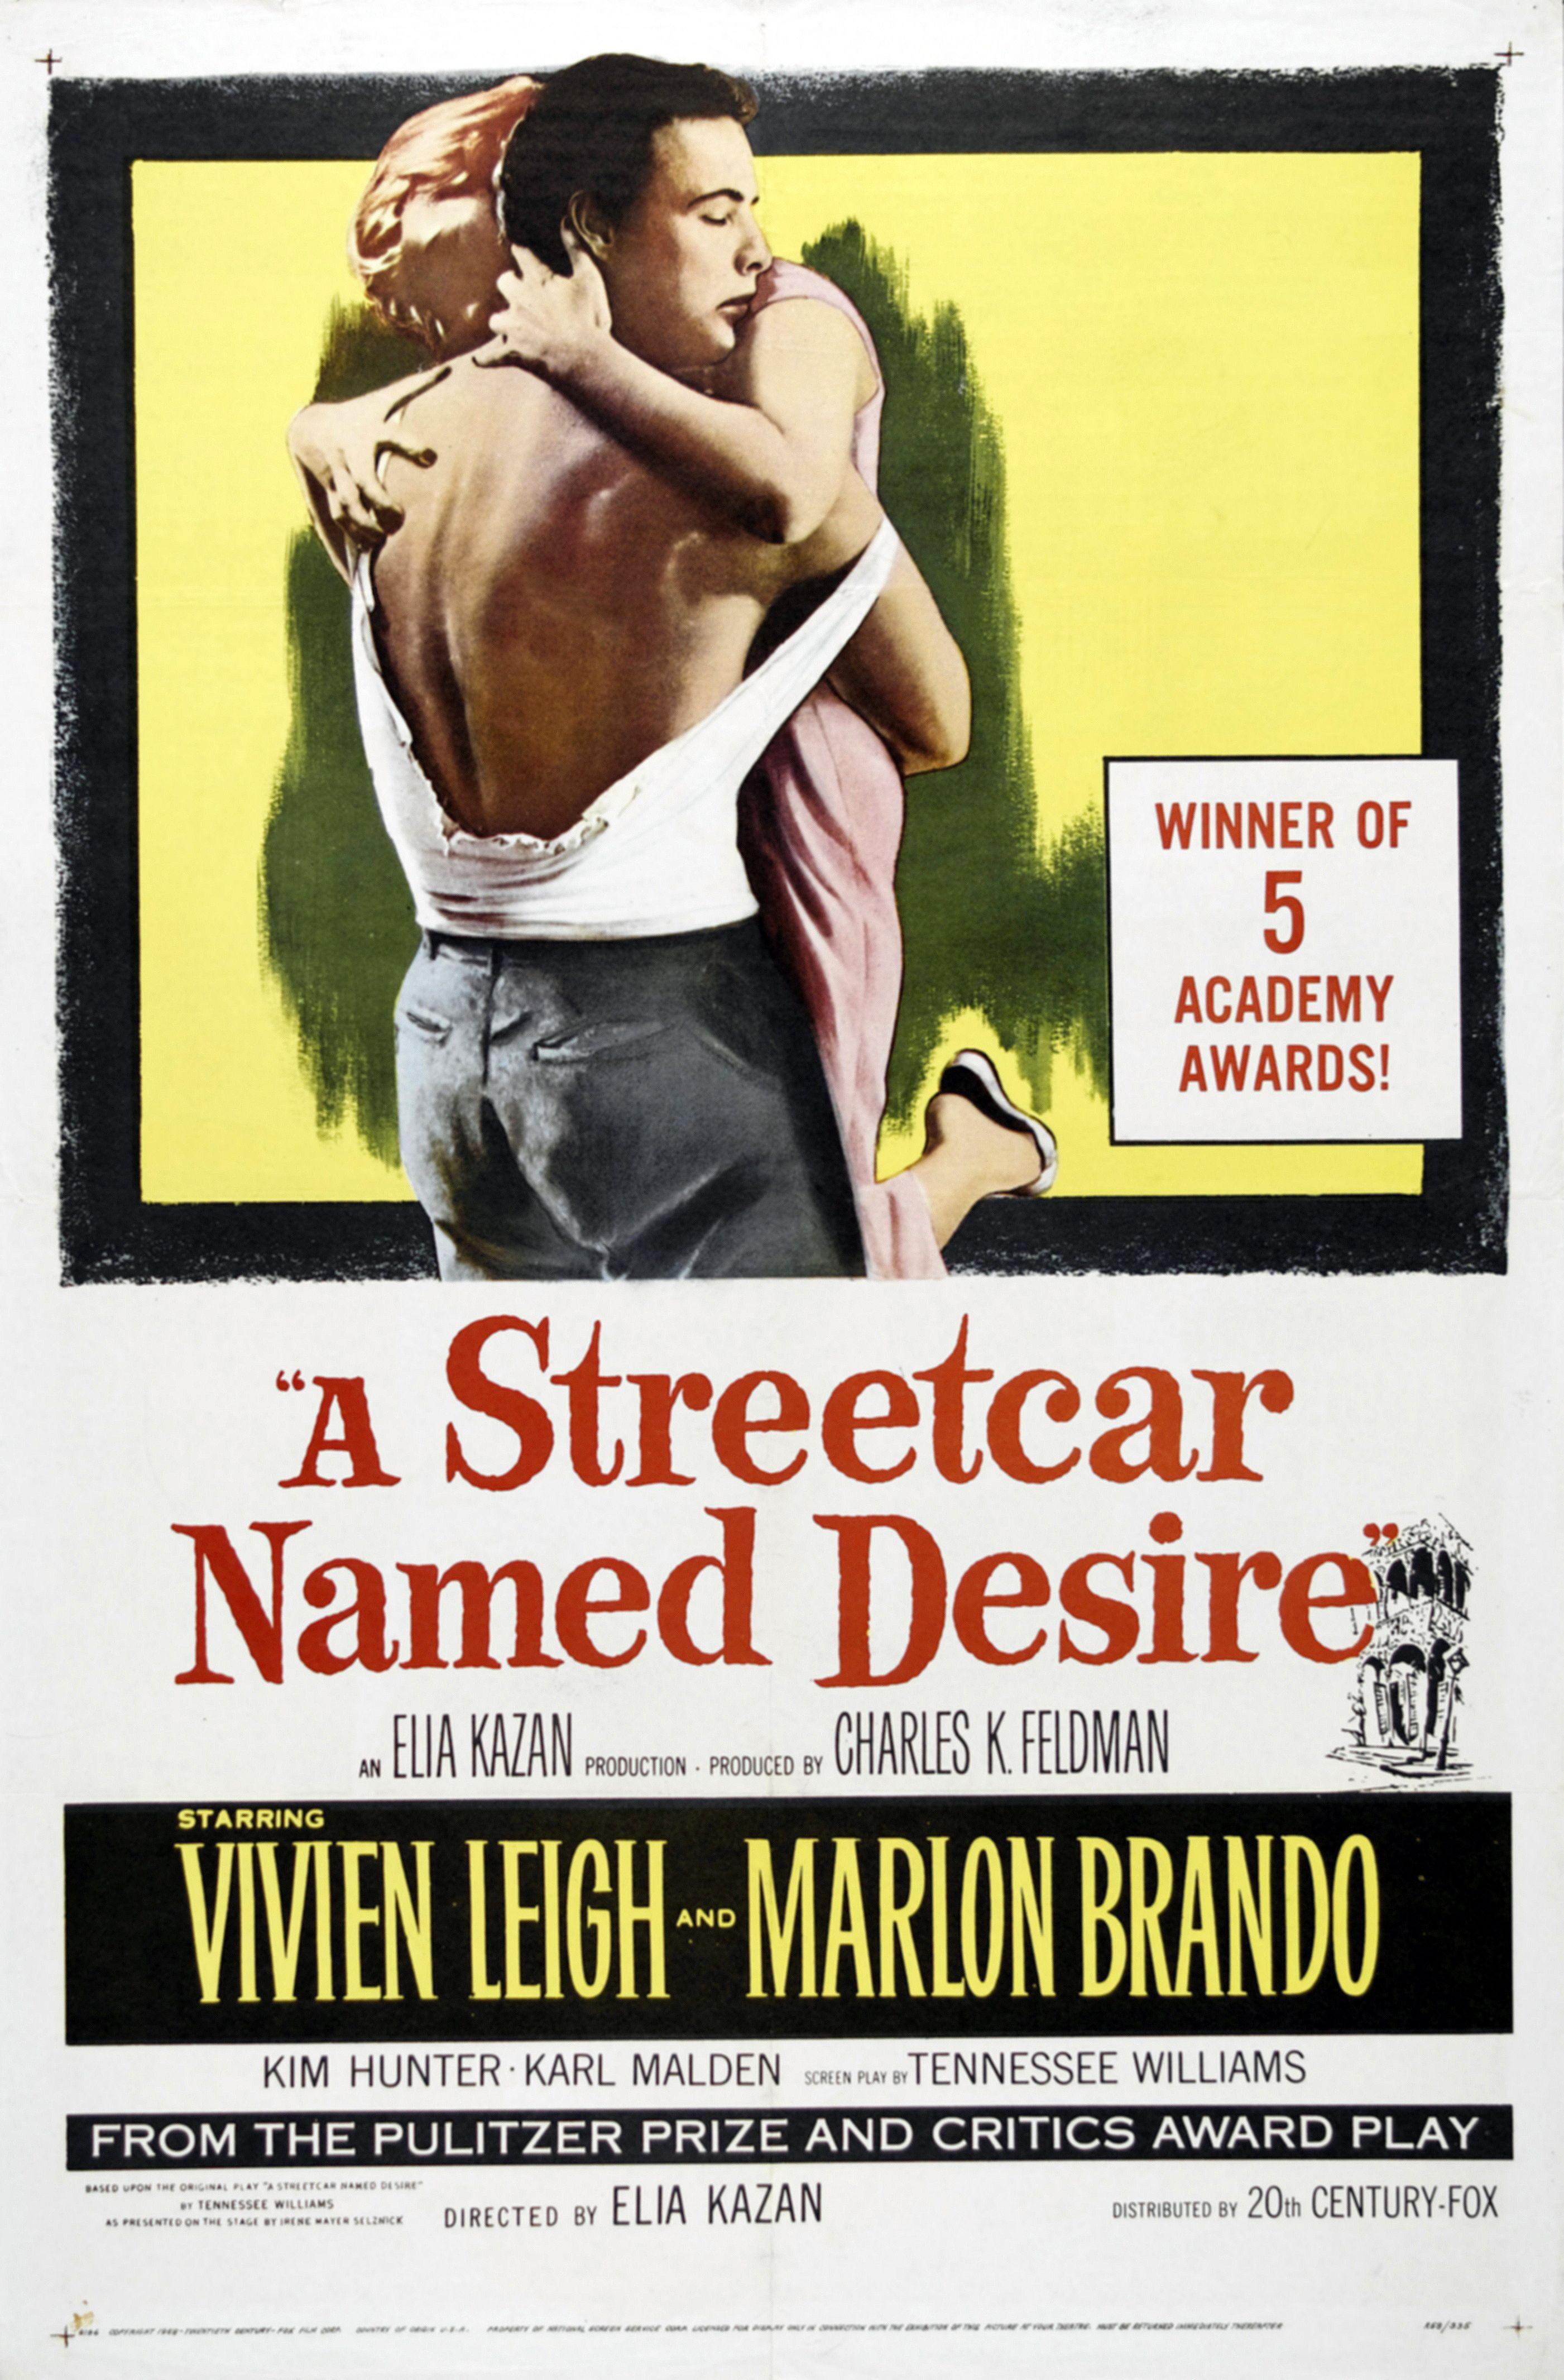 A streetcar named desire topic sentence